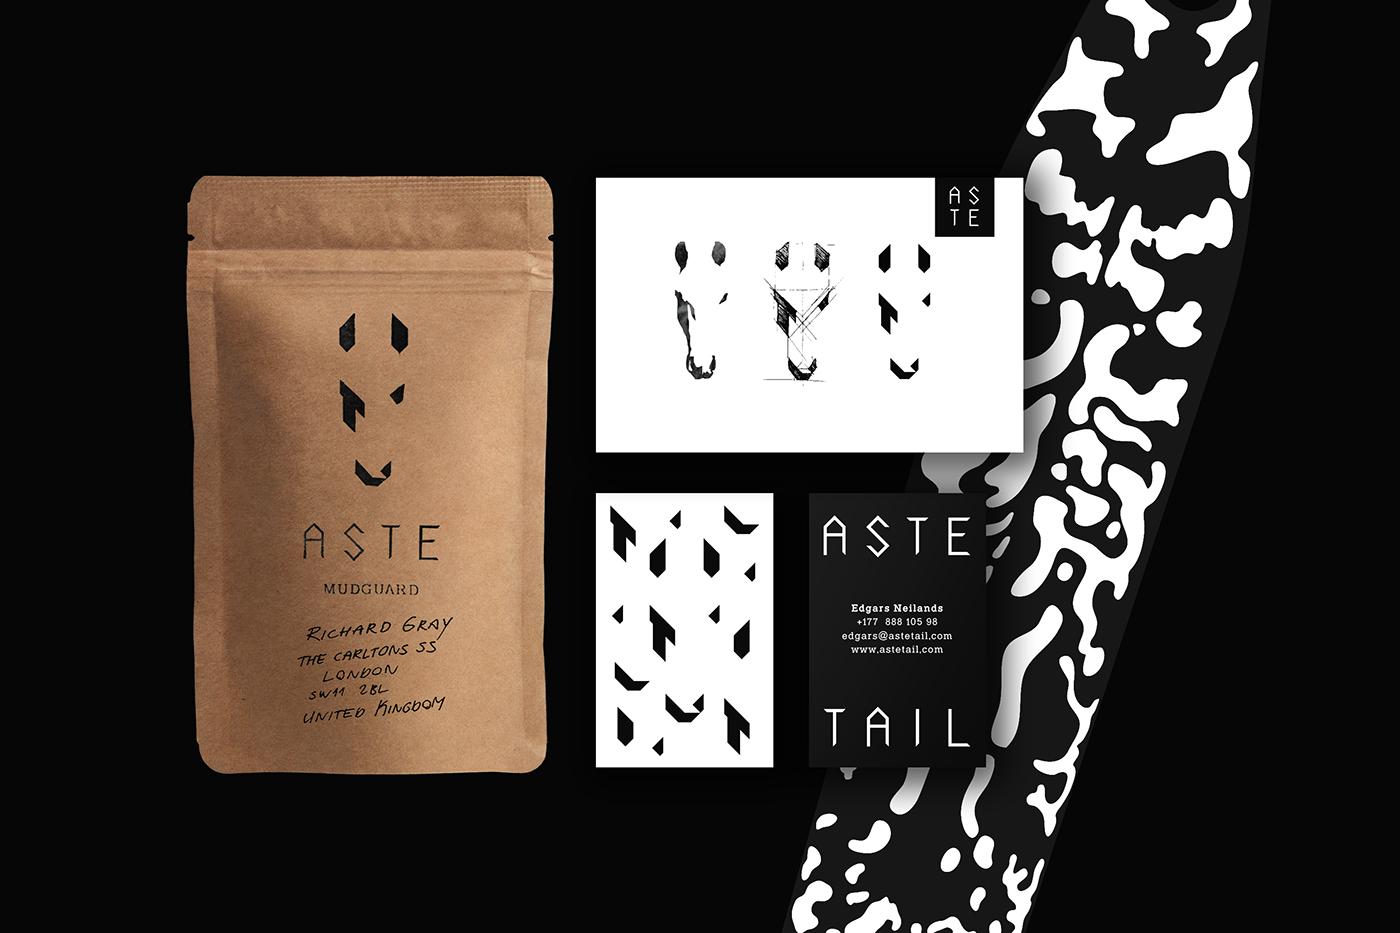 ASTE-logo-o-tail copy copyccccc.jpg